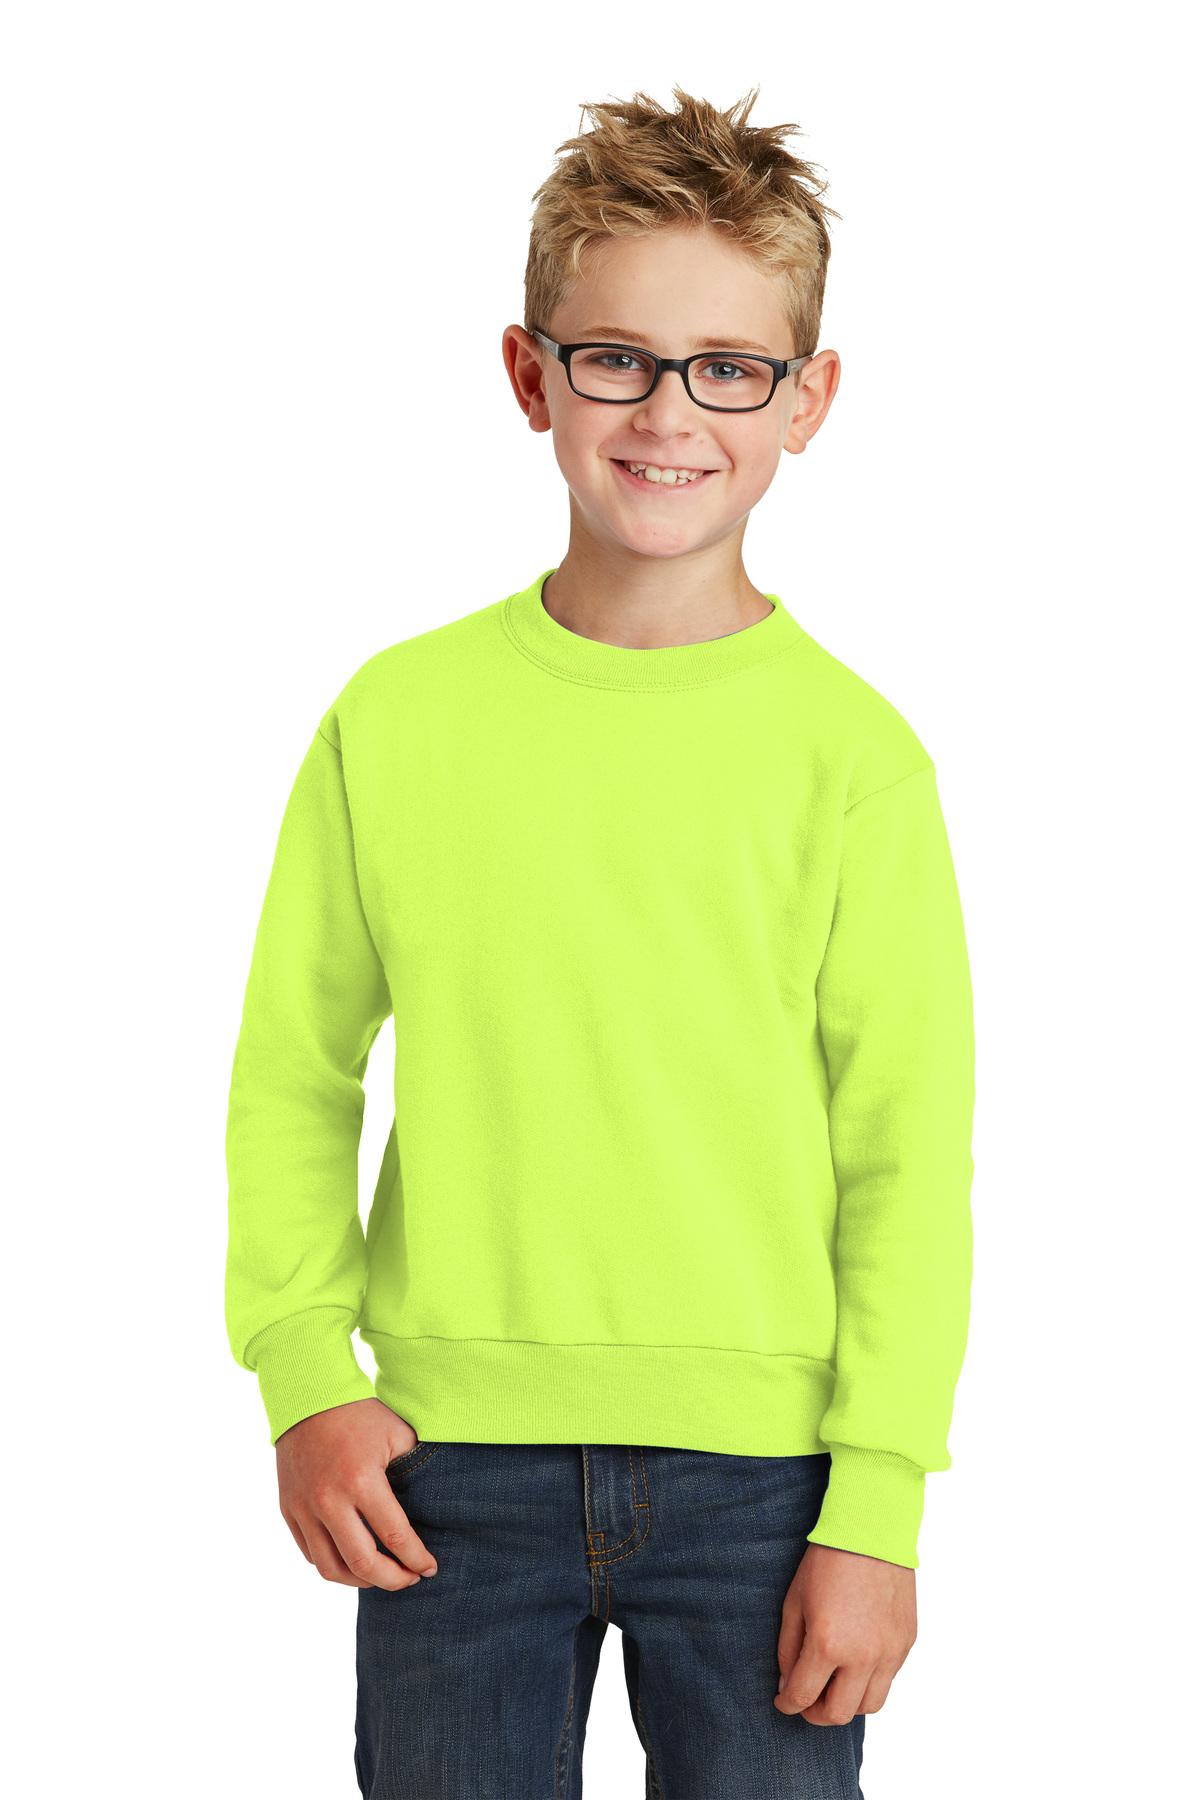 Port /& Company Youth Crewneck Sweatshirt XL Sangria